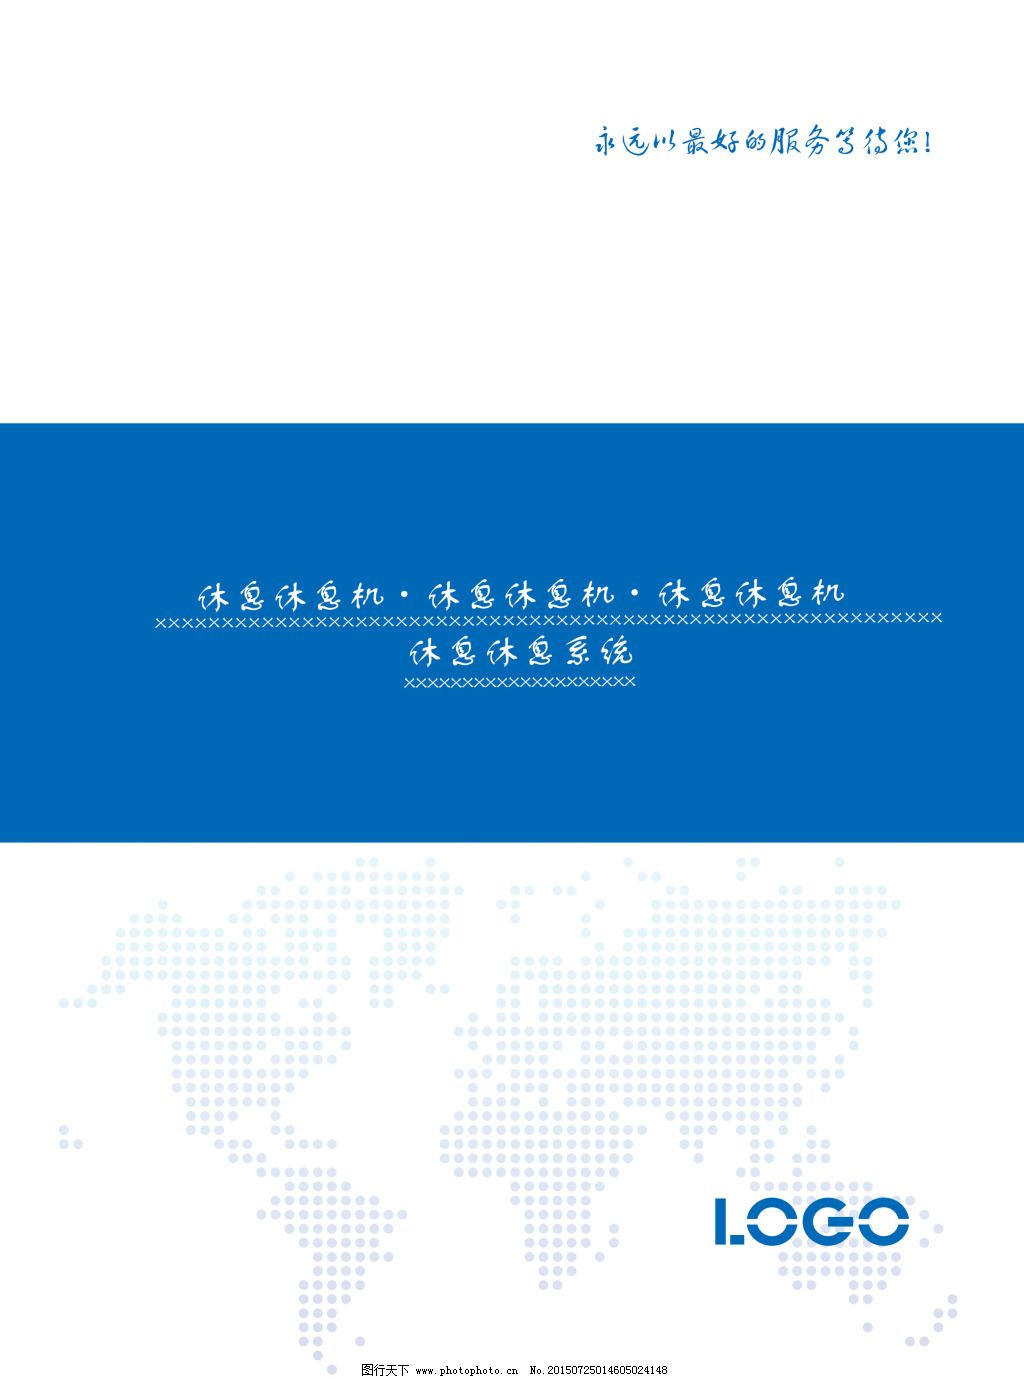 vi合同书规范格式_机械公司vi 合同书 原创设计 其他原创设计